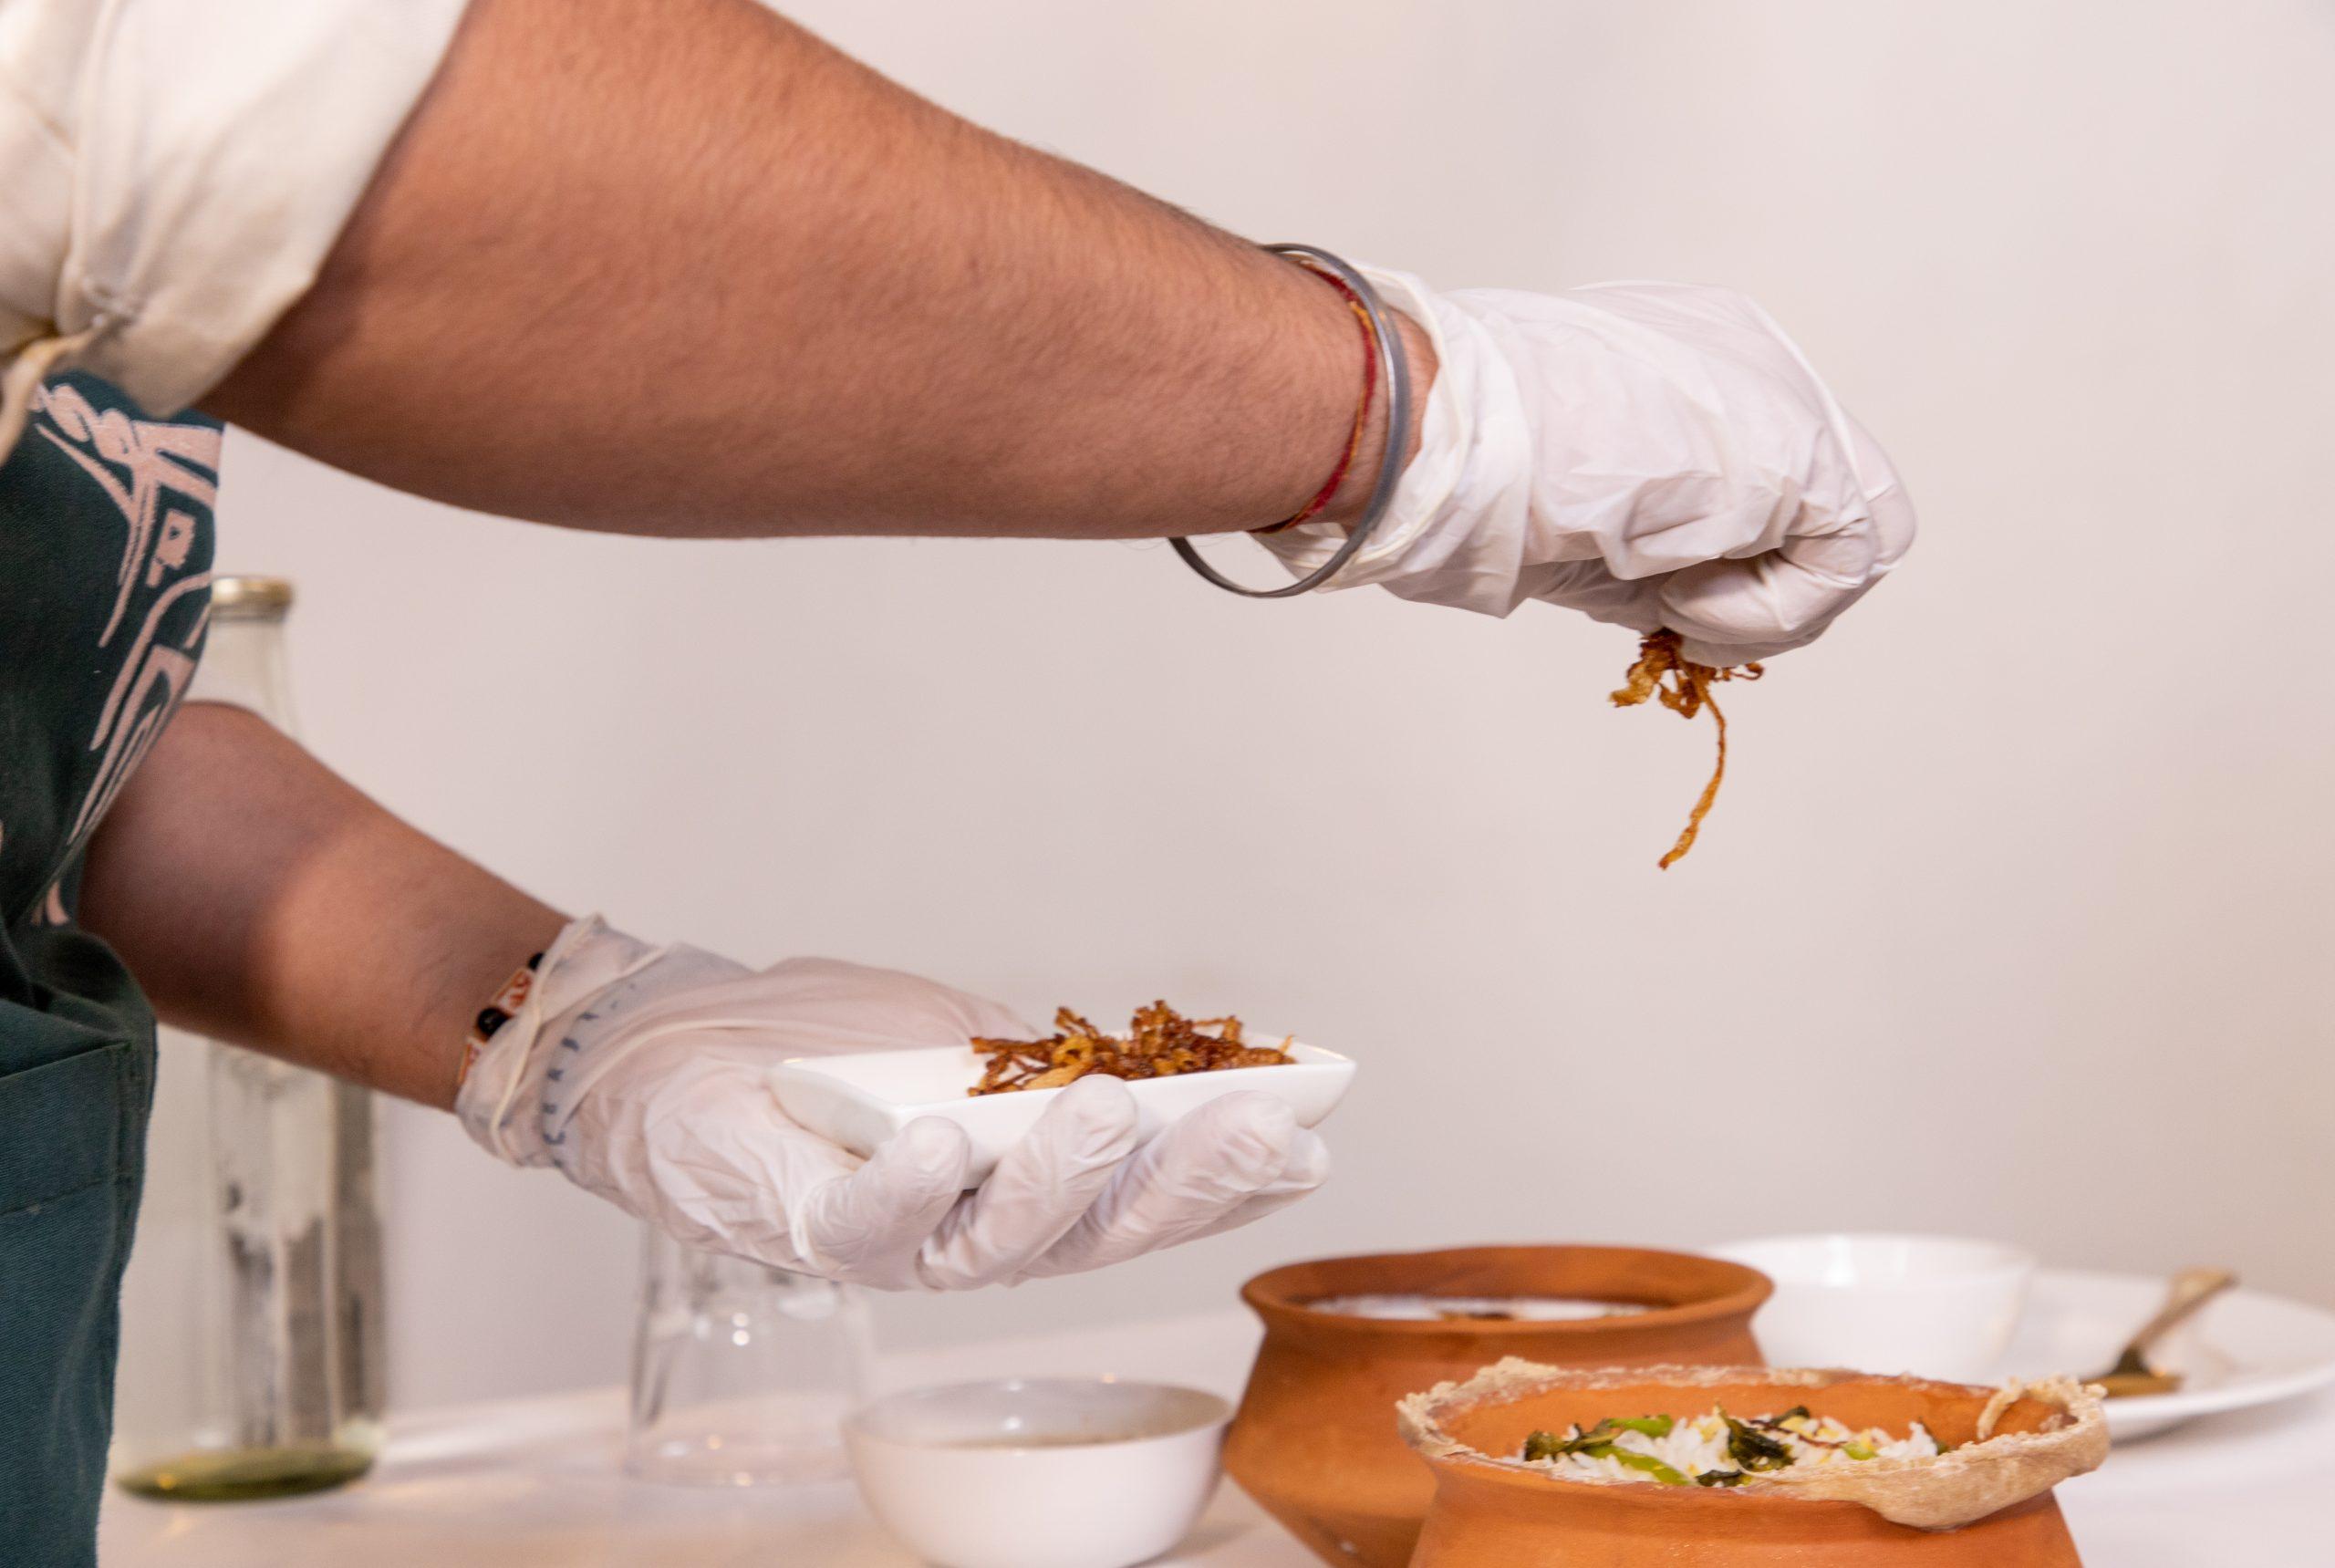 Chef garnishing biryani